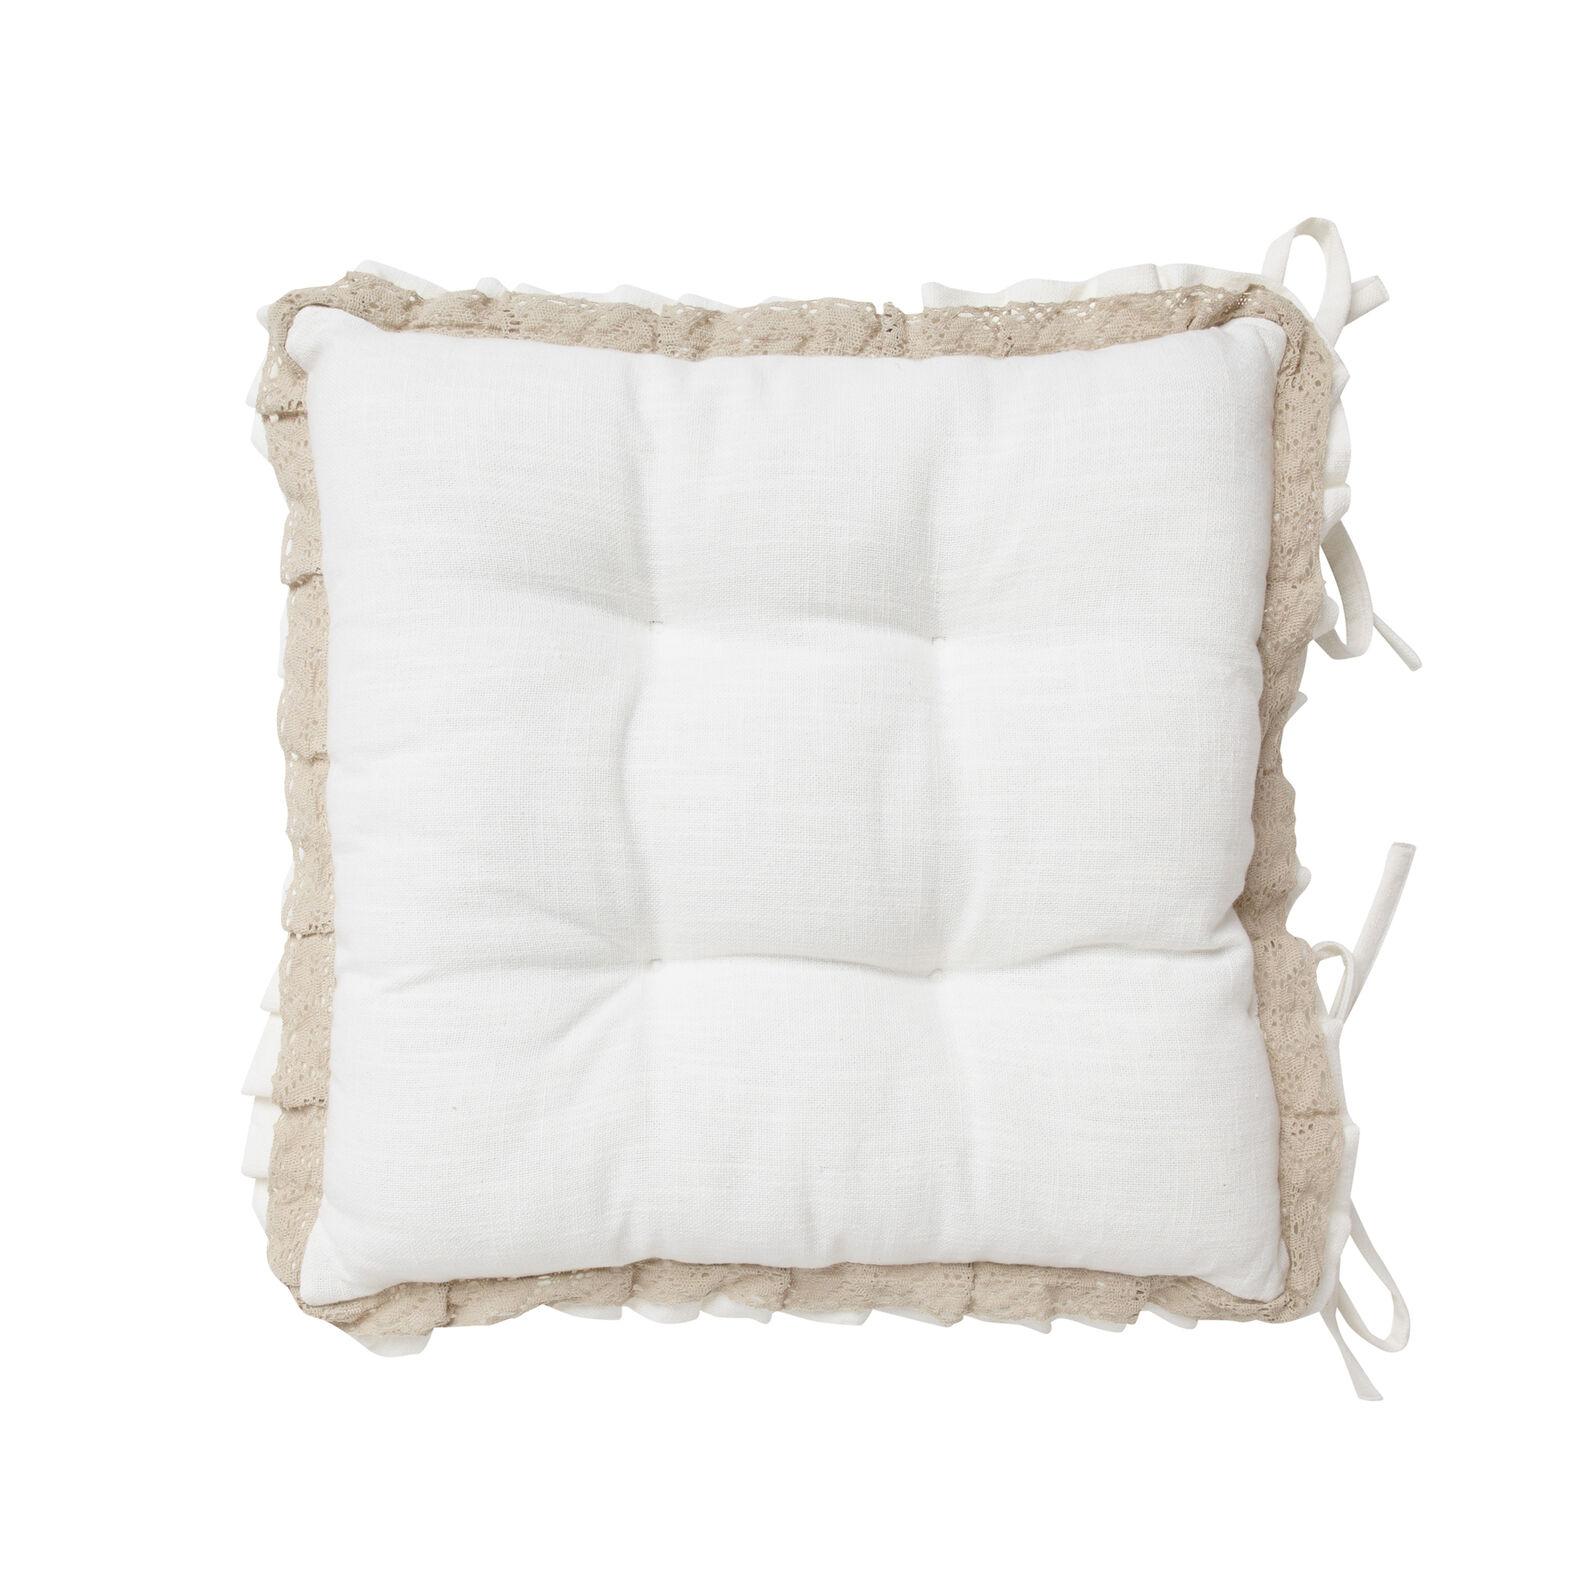 Burano lace seat pad